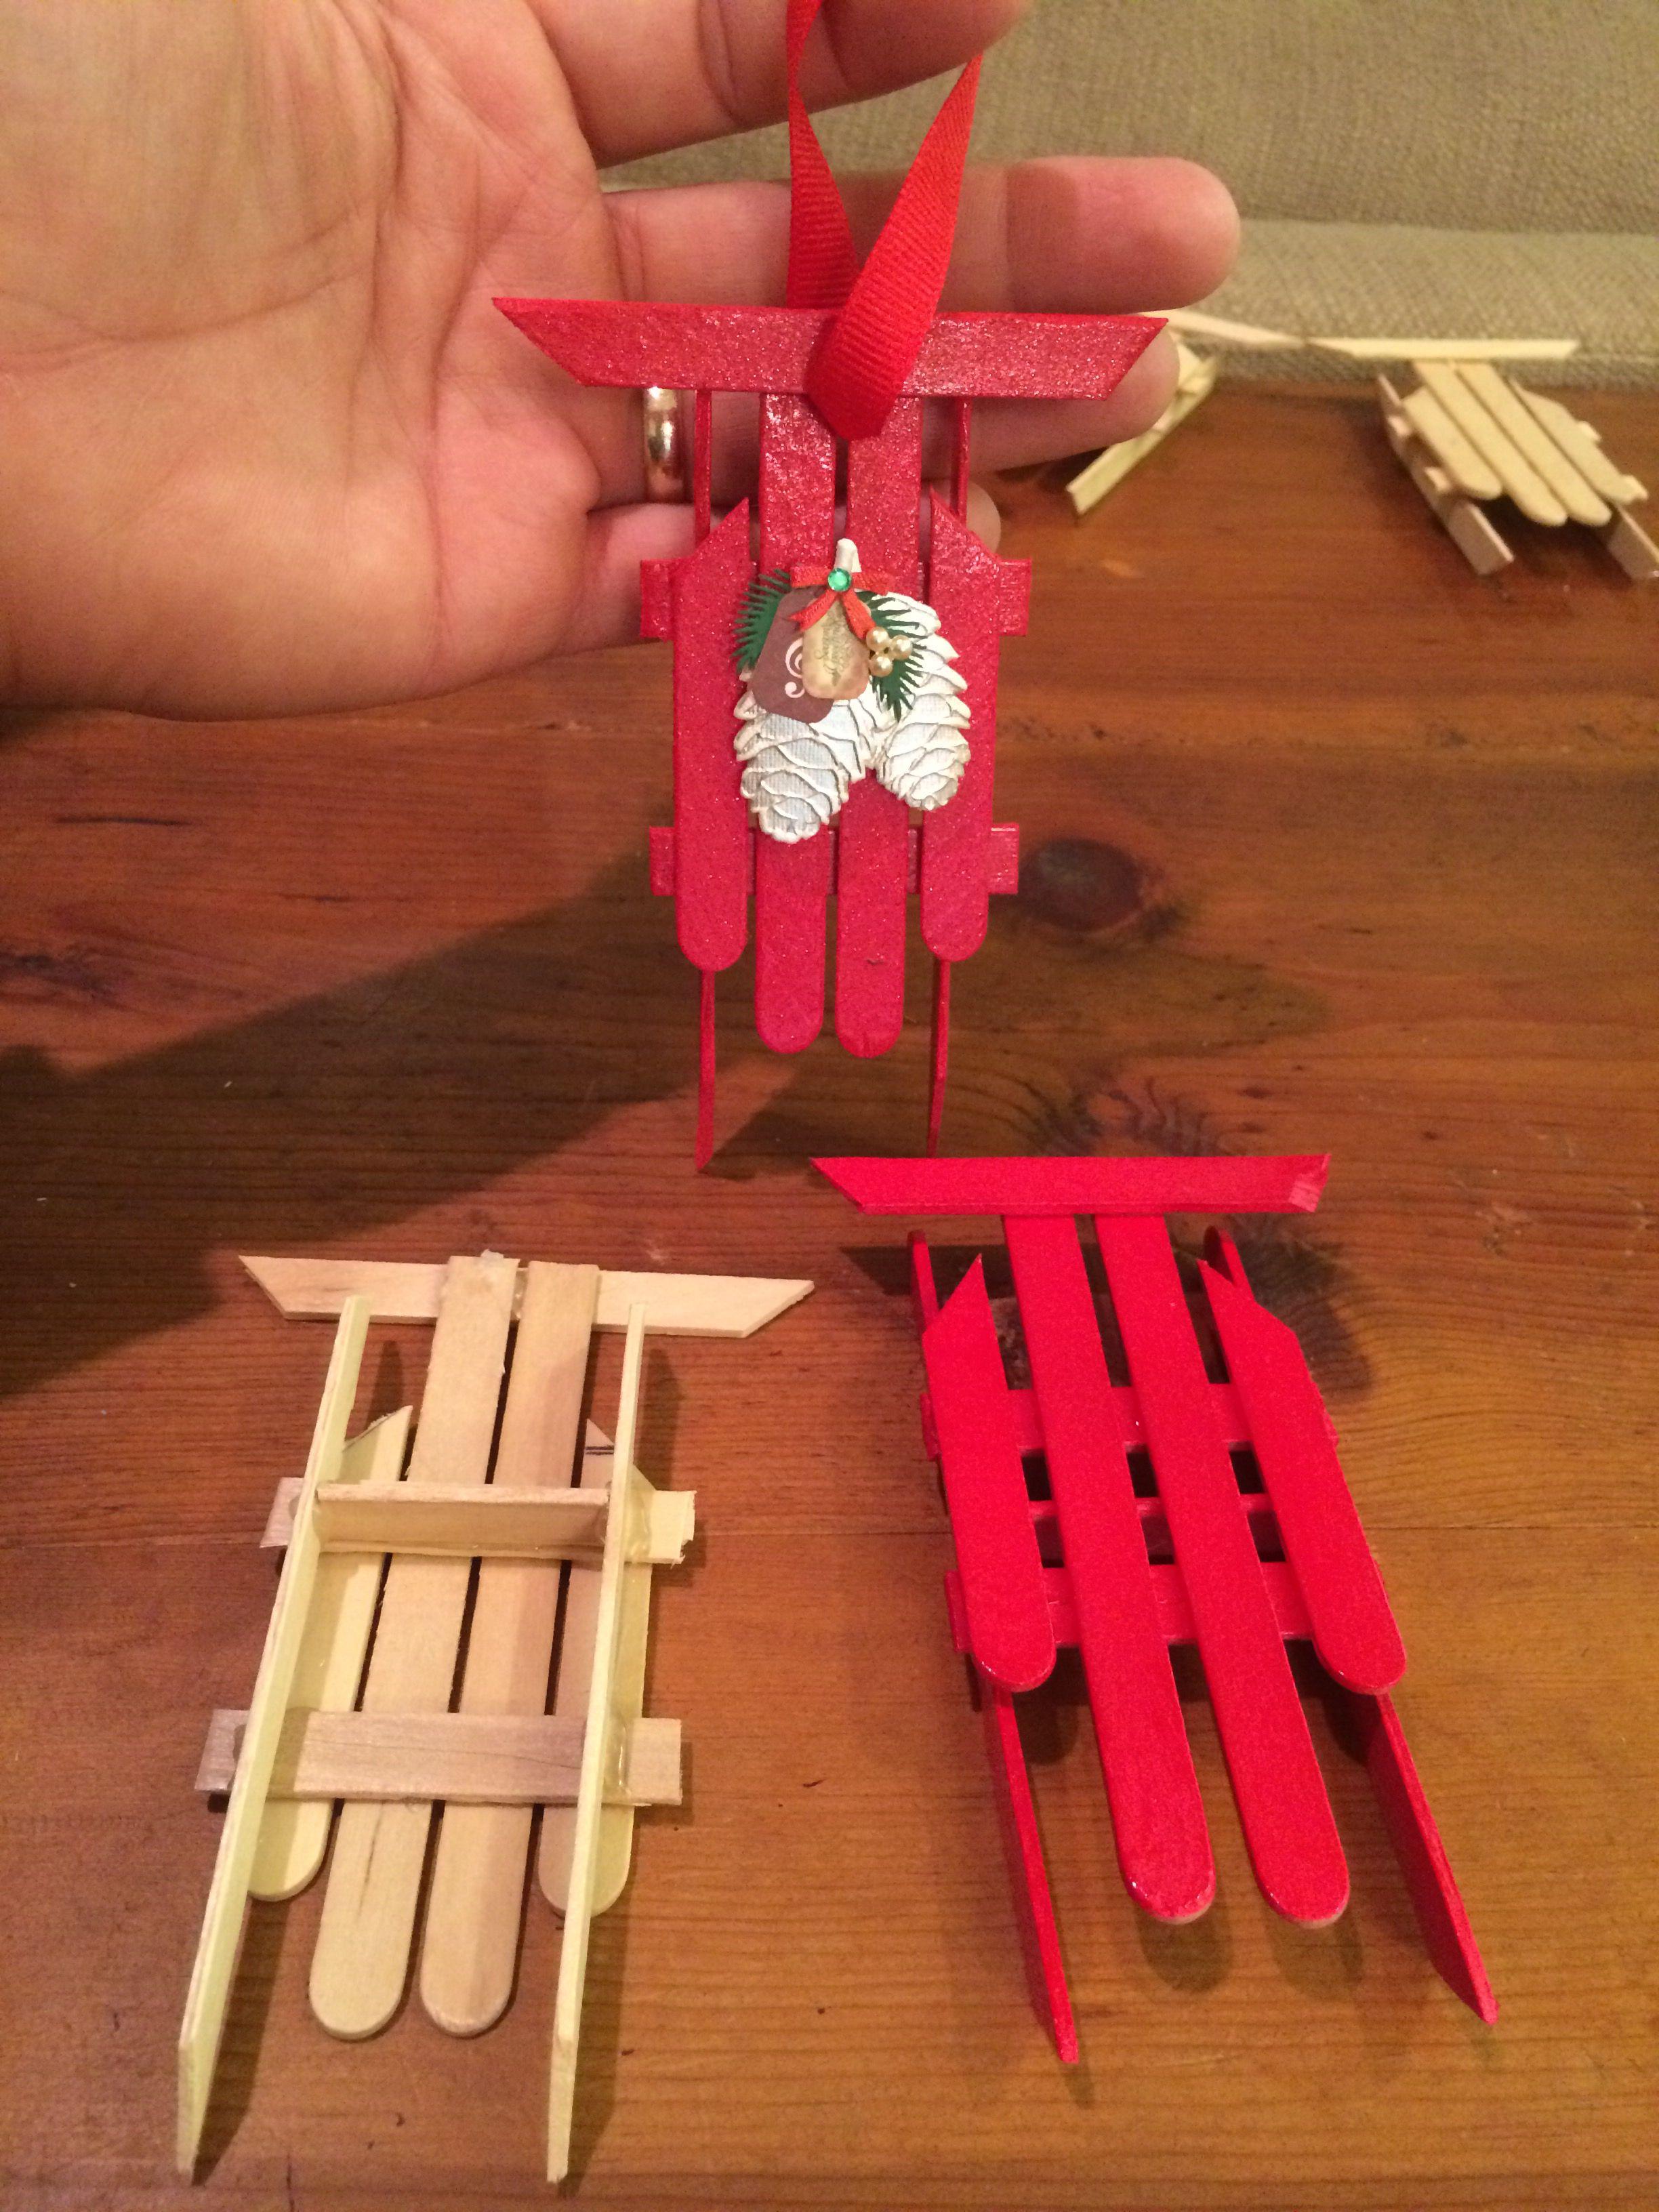 Popsicle stick sleds Great ornament t idea